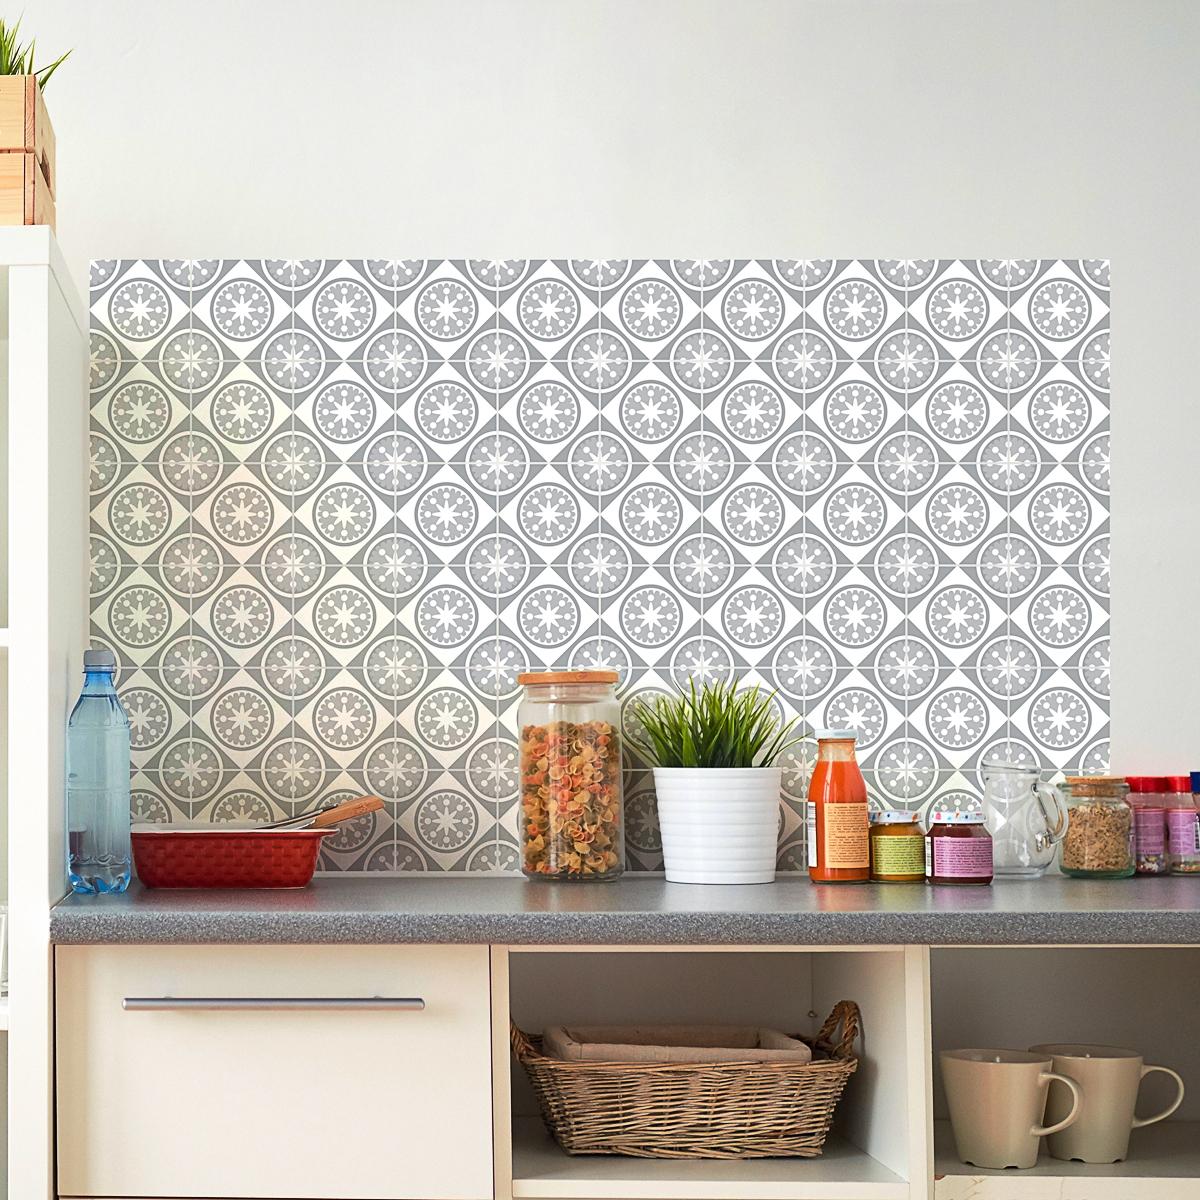 carrelage design azulejos carrelage moderne design pour carrelage de sol et rev tement de tapis. Black Bedroom Furniture Sets. Home Design Ideas